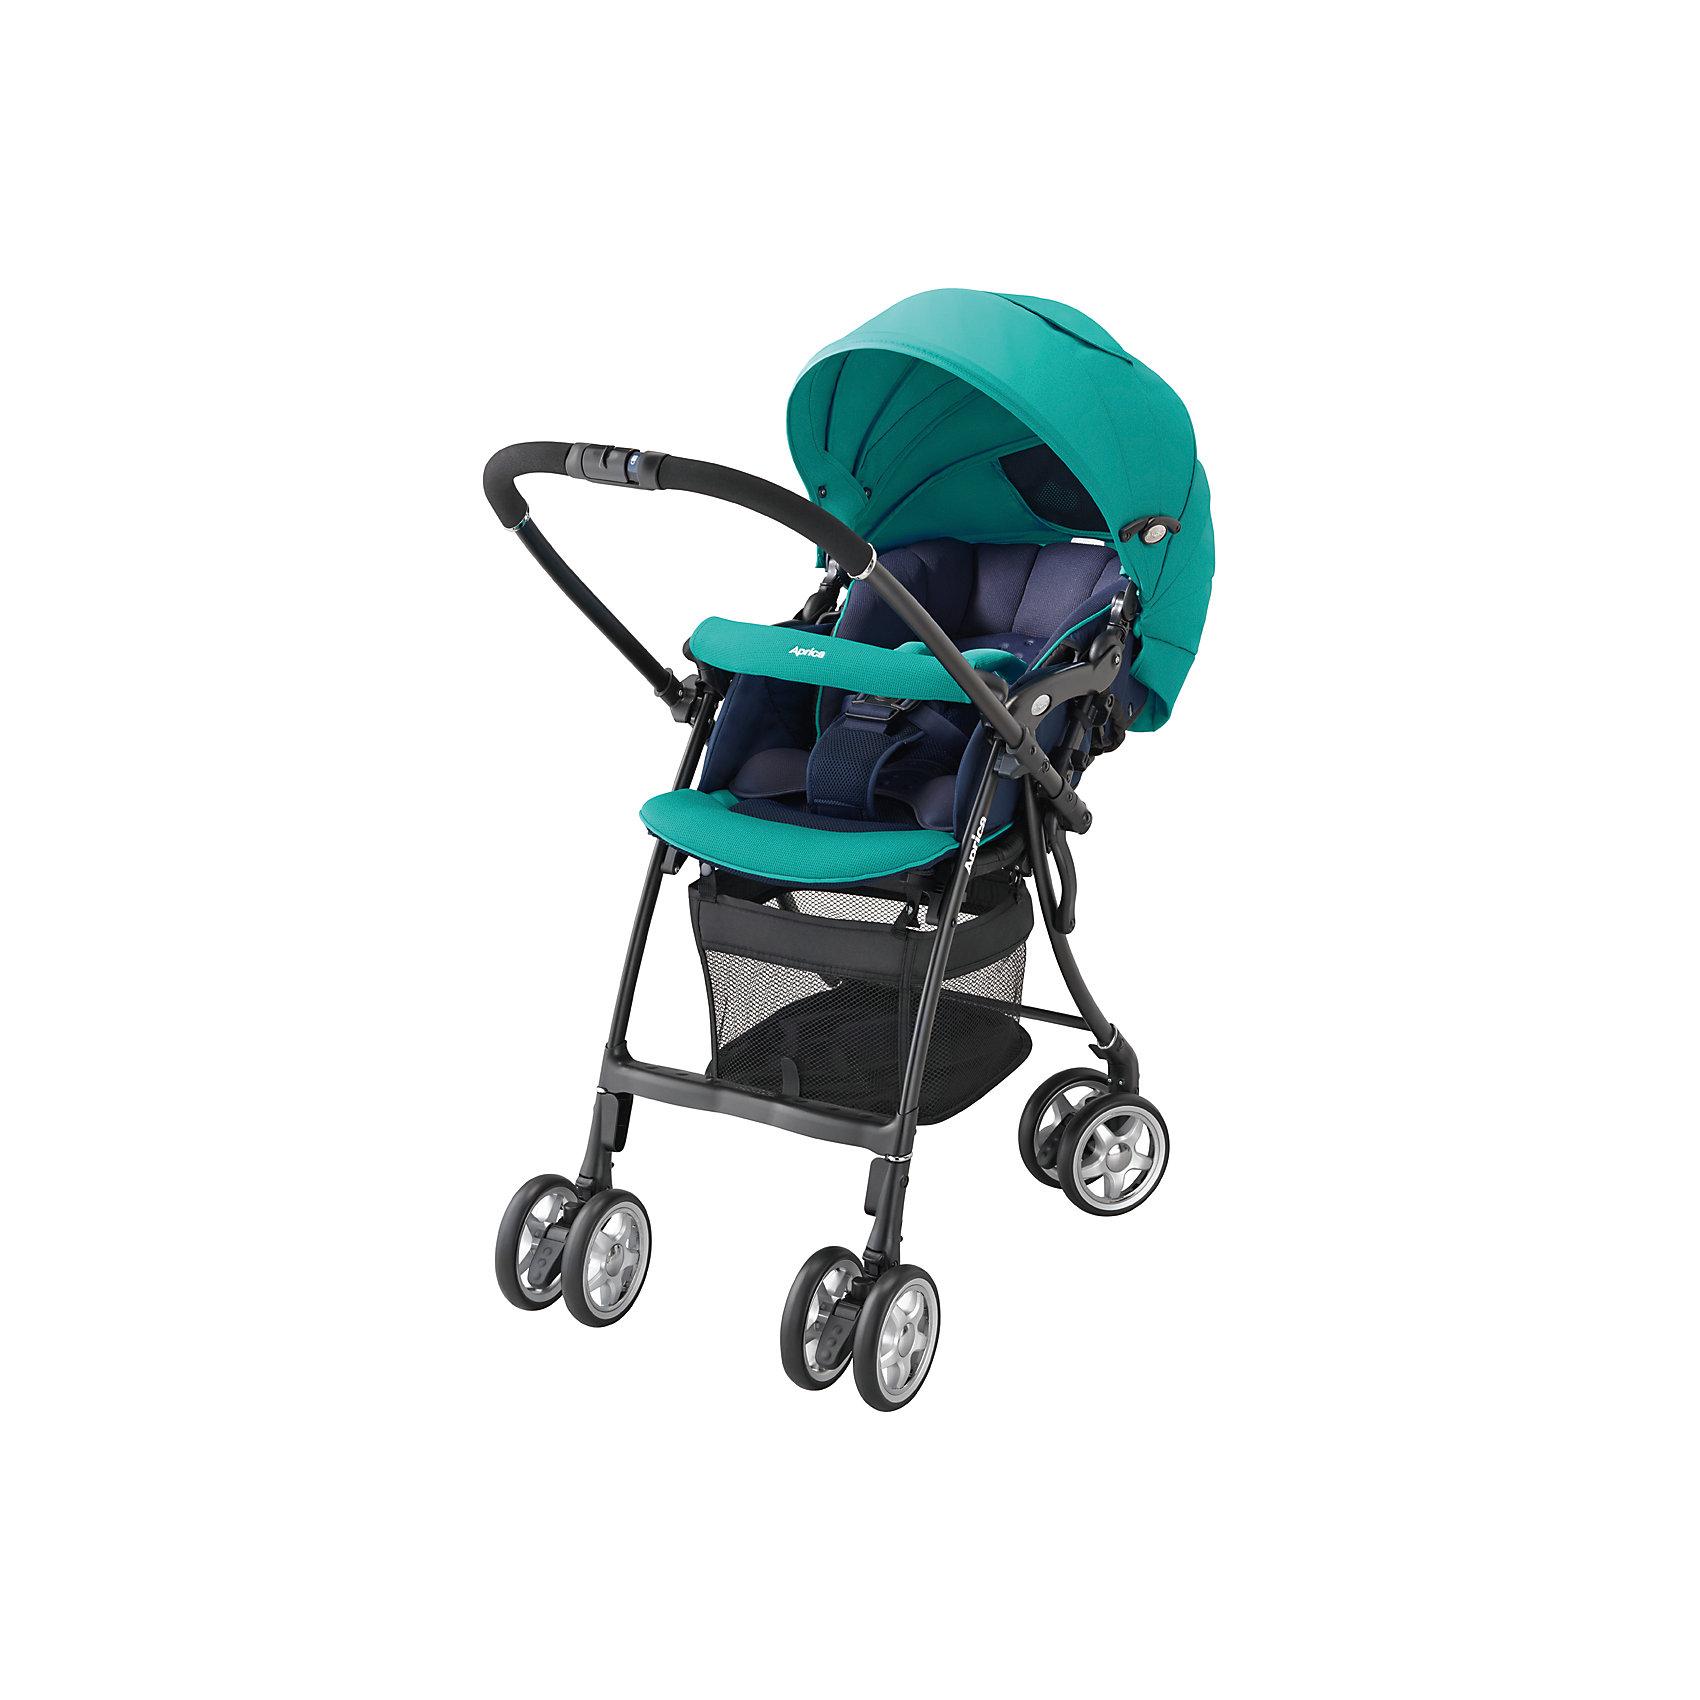 Aprica Прогулочная коляска Air Ria Lux, Aprica, /синий прогулочные коляски aprica luxuna air